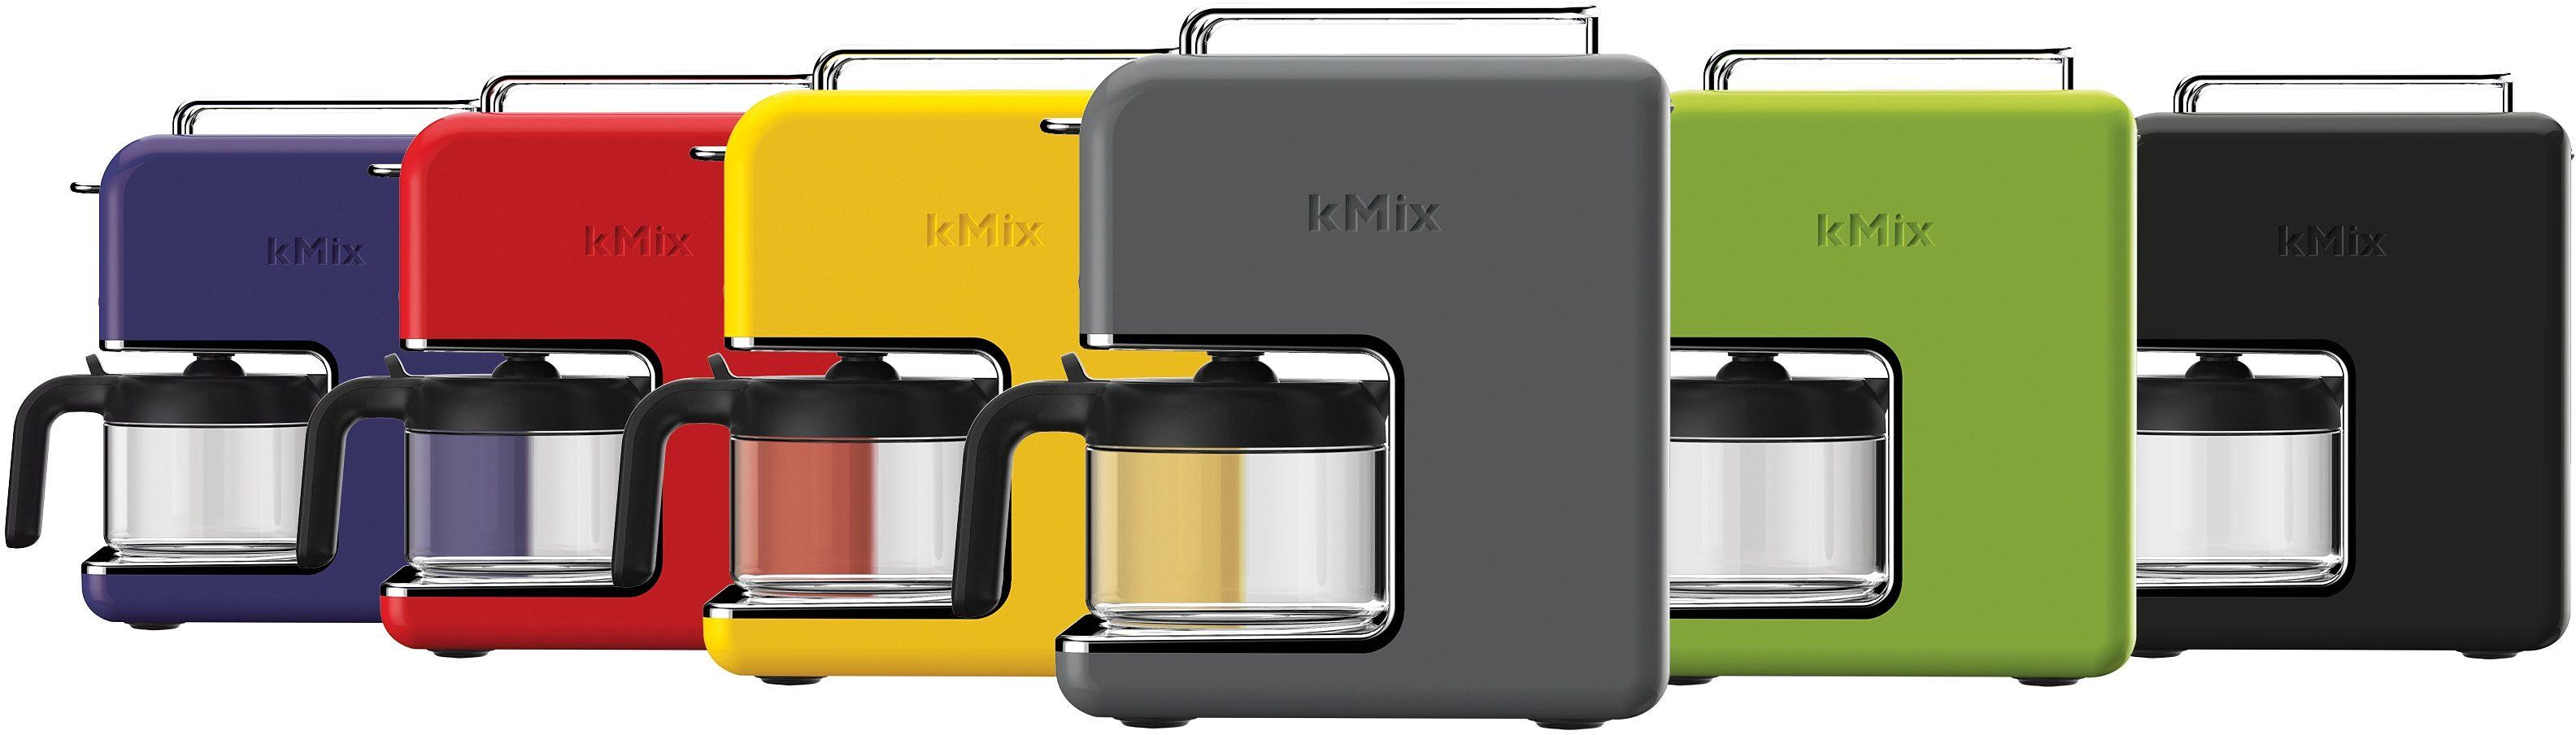 Kenwood Küche Filterkaffeemaschine kMix CM030GY, 0,75l Kaffeekanne, Permanentfilter 1x2